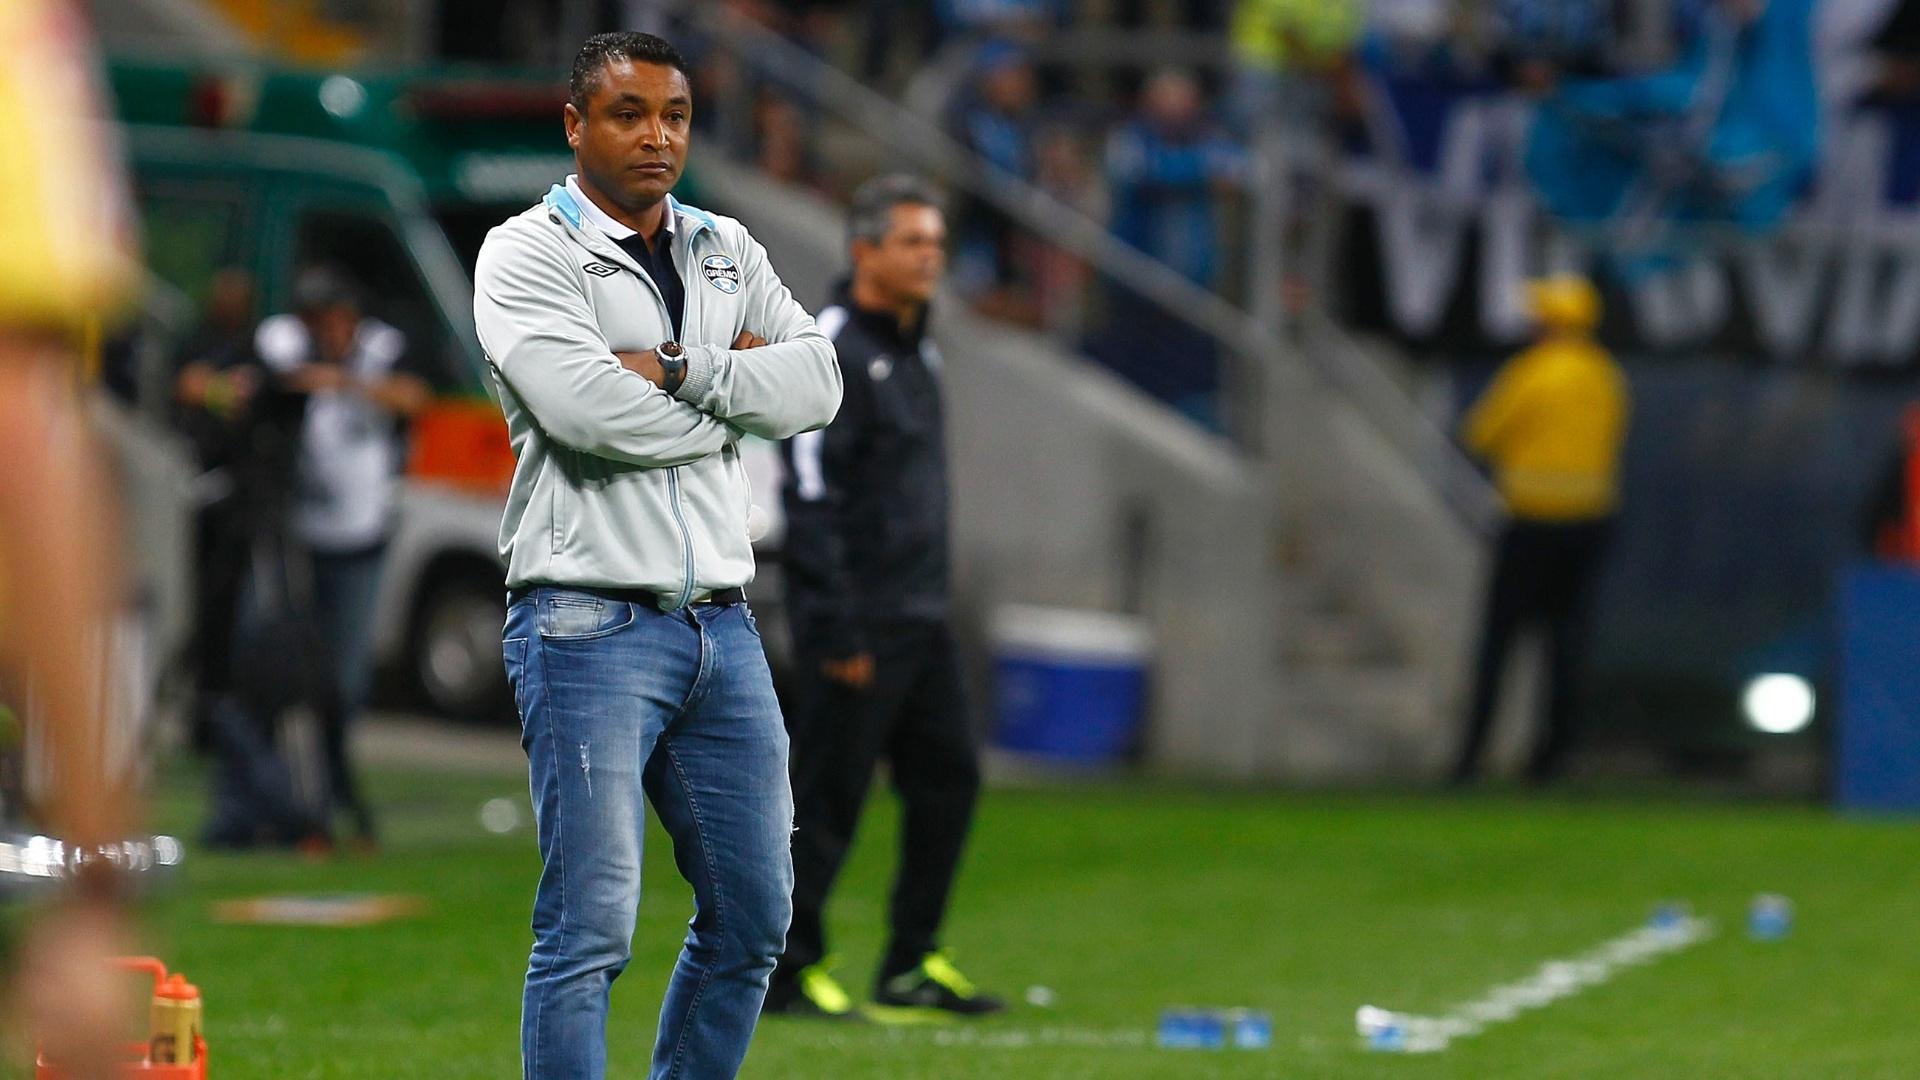 Roger Machado observa desempenho dos jogadores do Grêmio contra o Coritiba